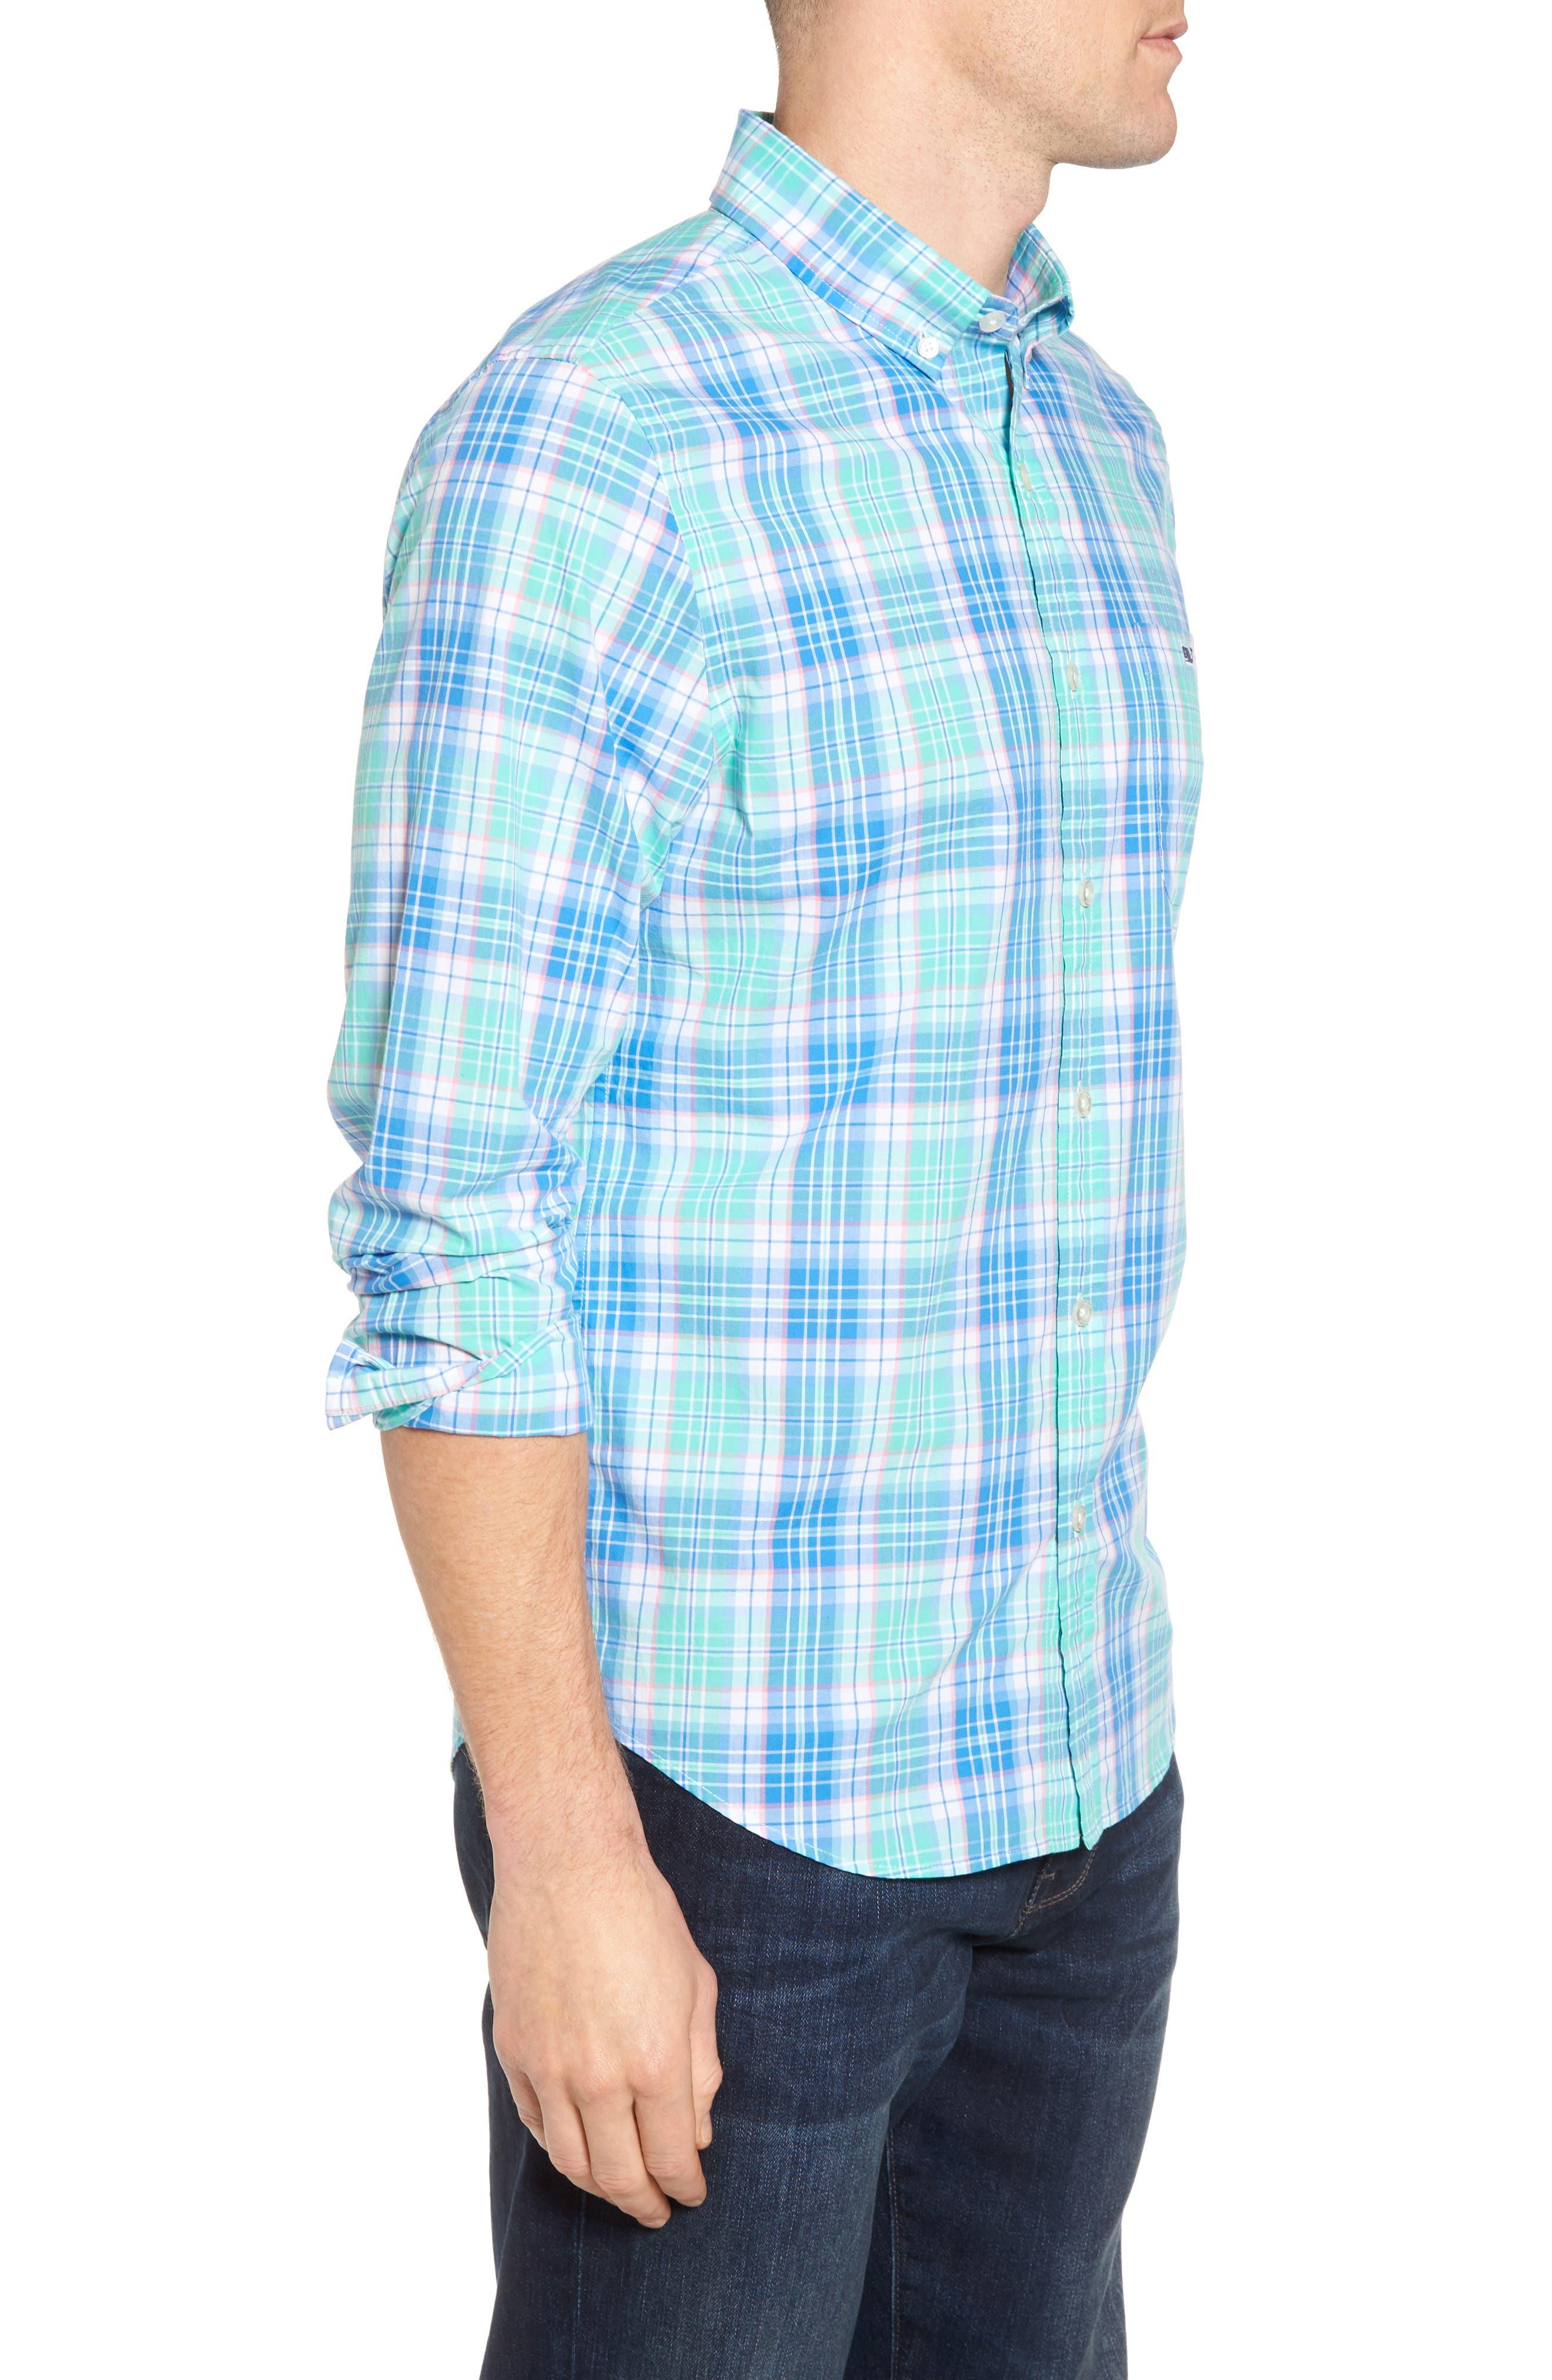 Sutherland Road Slim Fit Plaid Sport Shirt,                             Alternate thumbnail 3, color,                             359